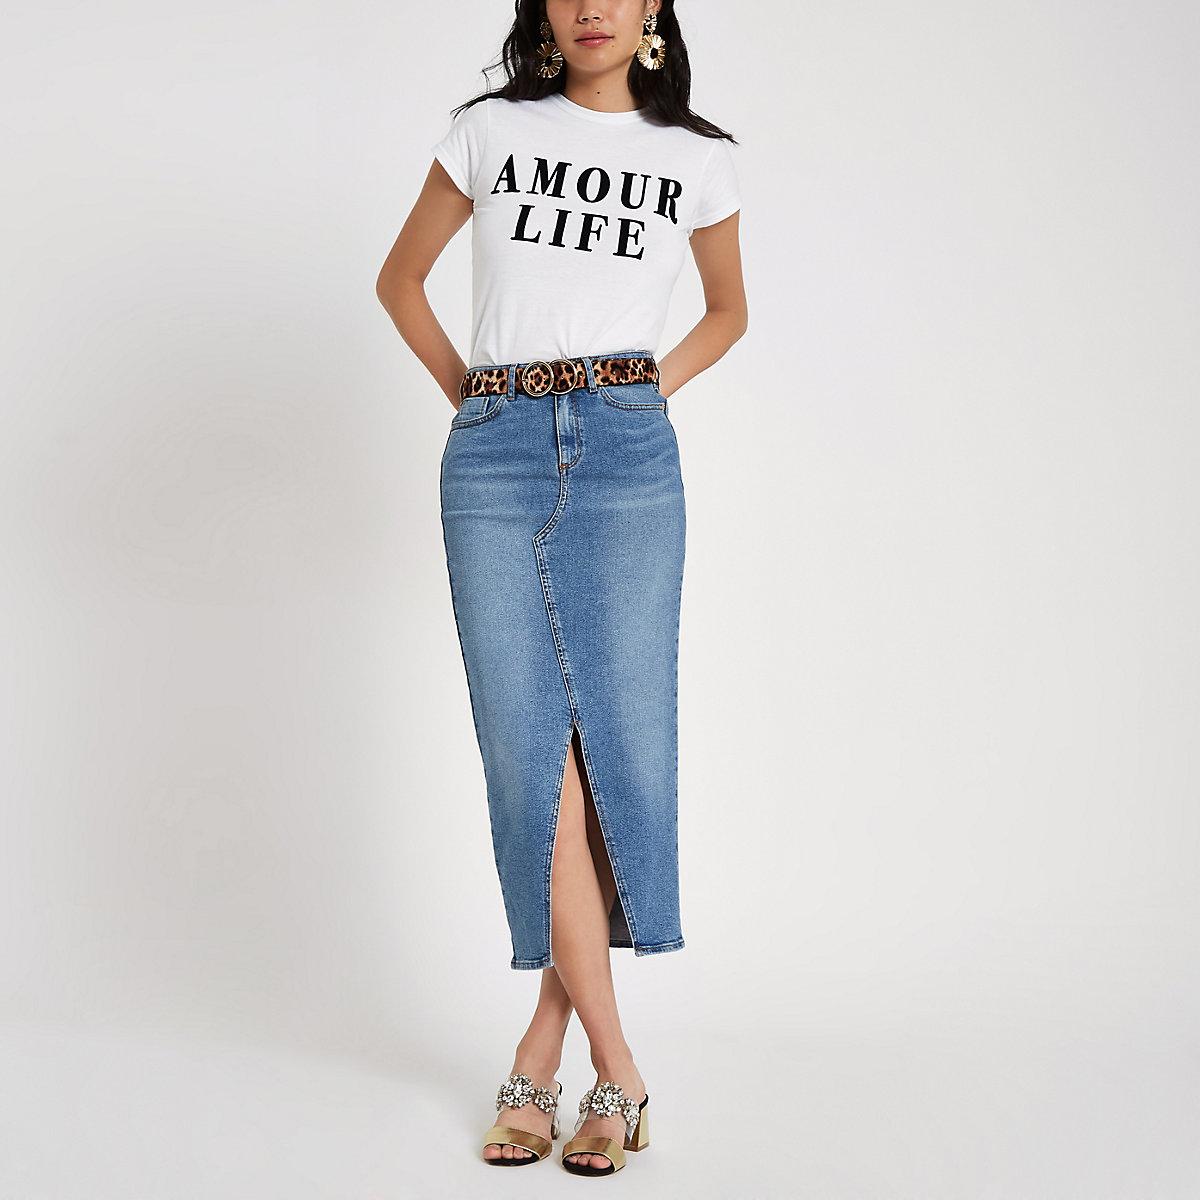 White 'amour life' flock print T-shirt